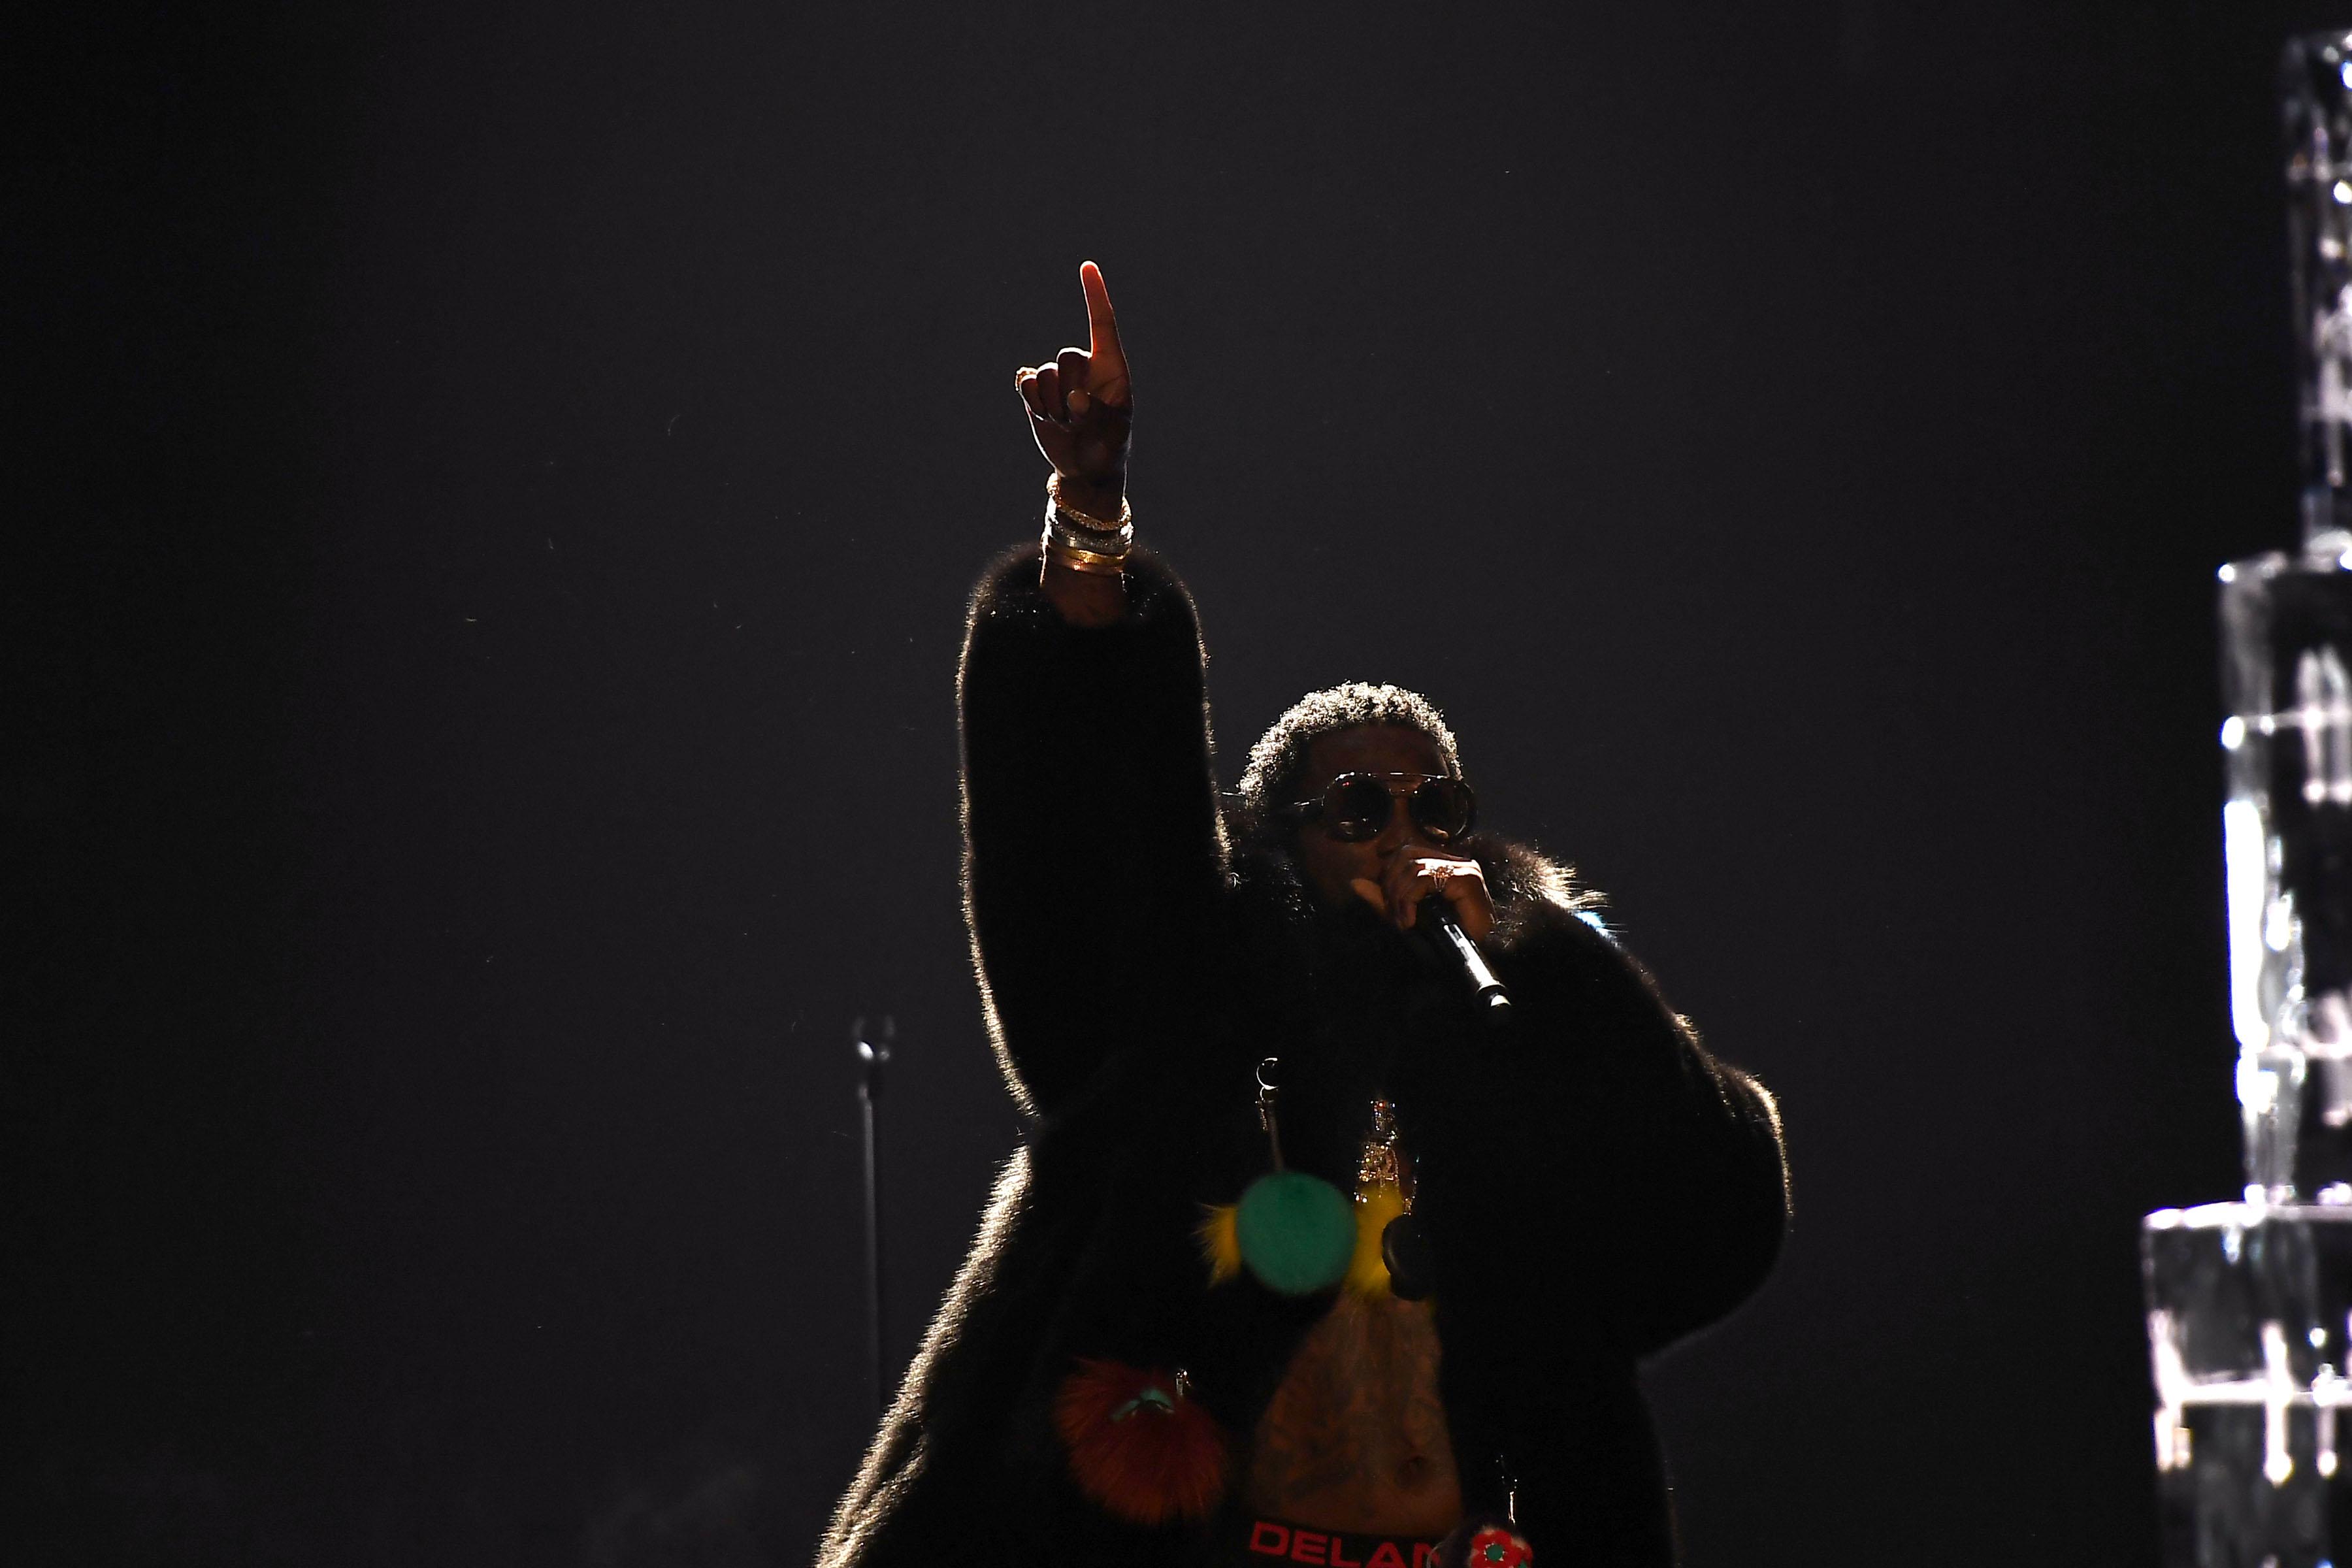 Gucci Mane at the 2016 BET Hip-Hop Awards